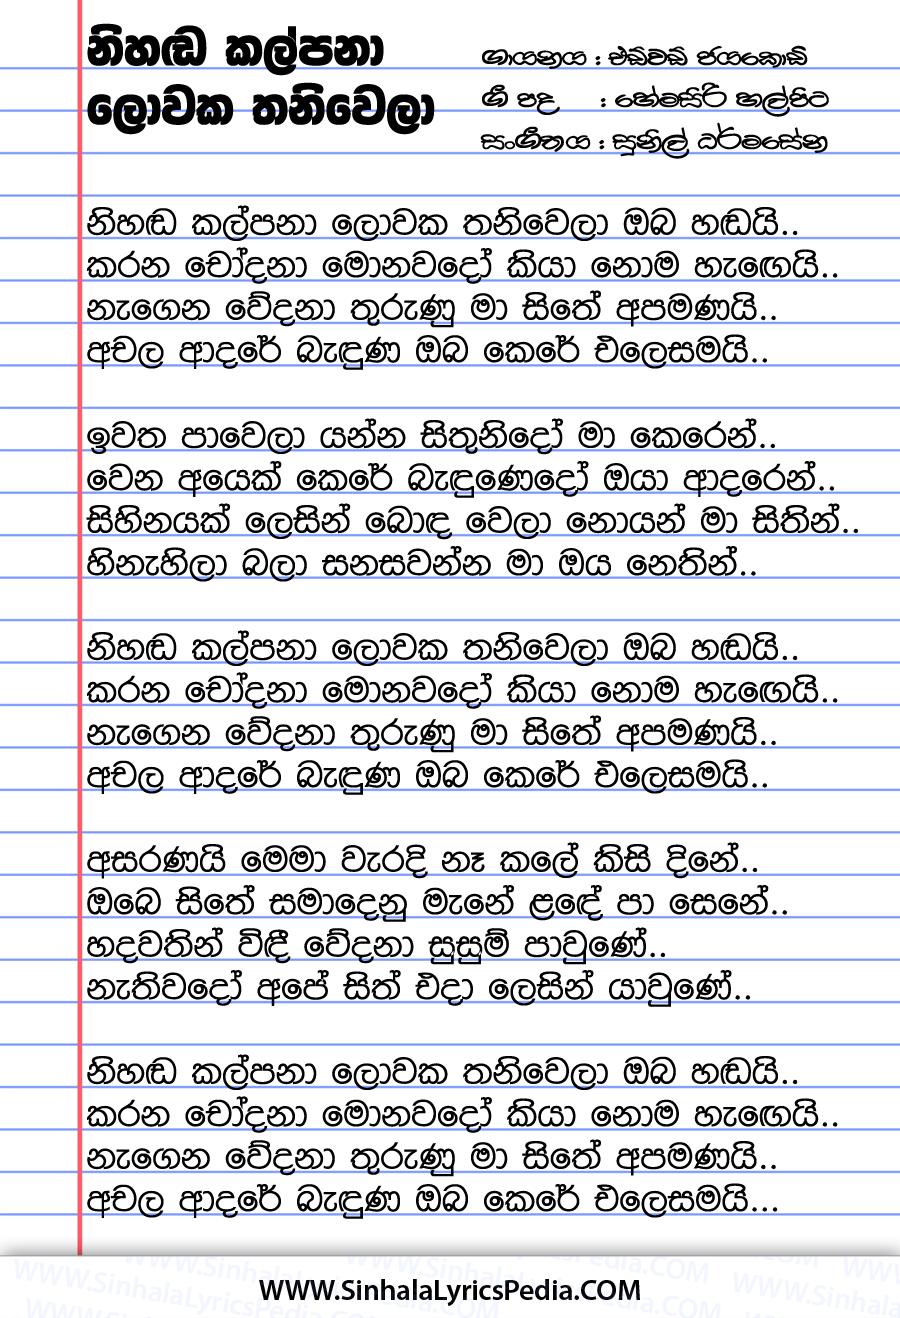 Nihada Kalpana Lowaka Thaniwela Oba Hadai Song Lyrics